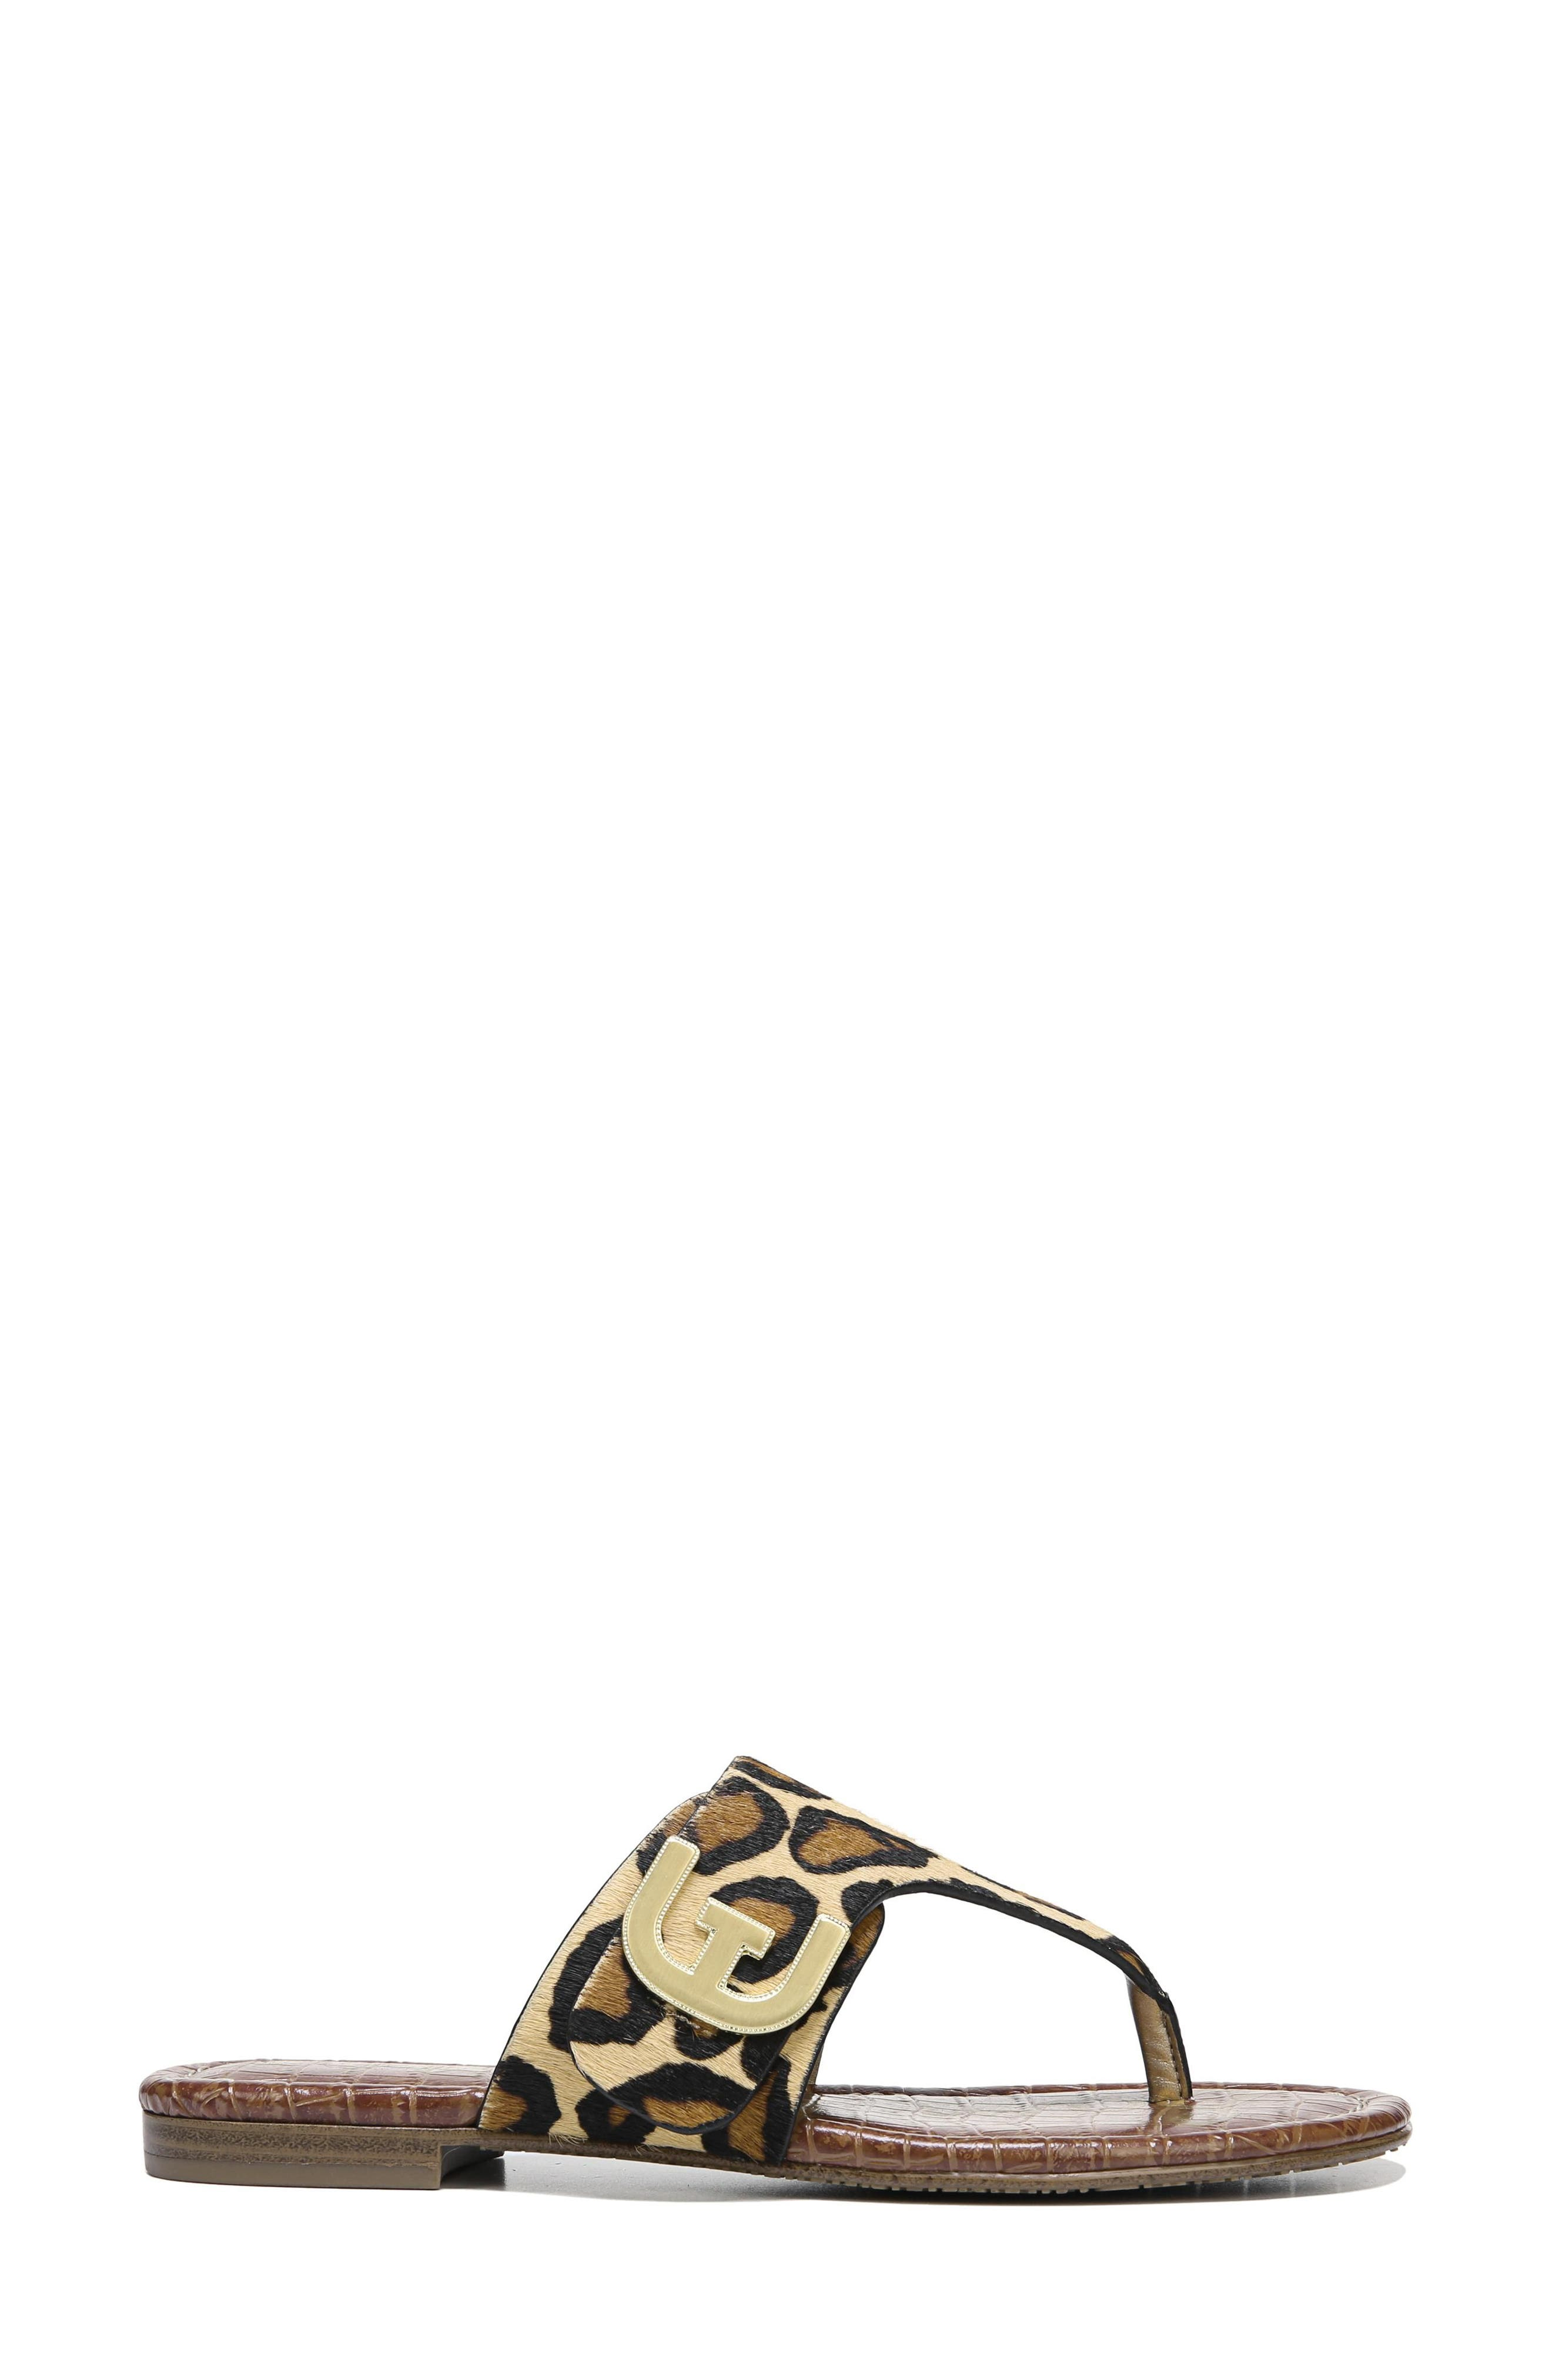 Barry Genuine Calf Hair V-Strap Sandal,                             Alternate thumbnail 3, color,                             New Nude Leopard Brahma Hair